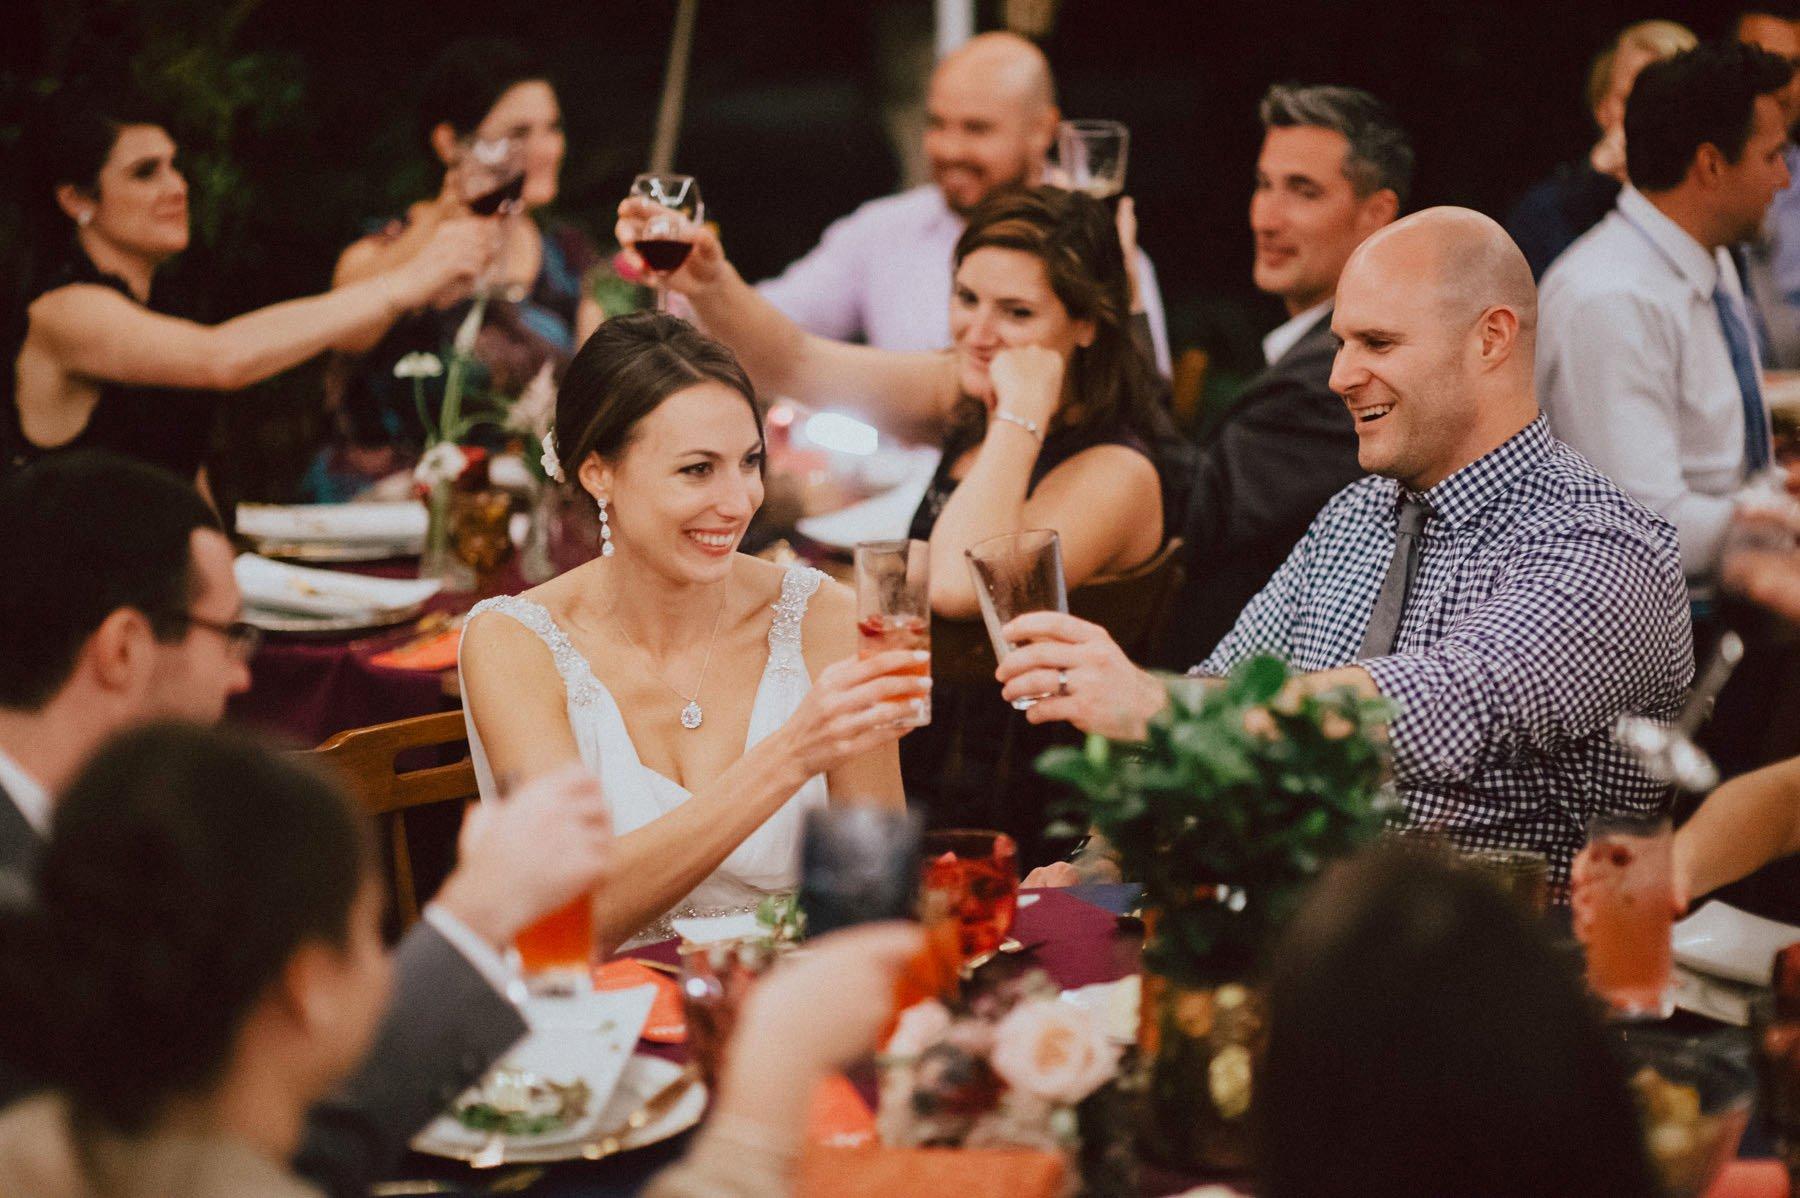 faunbrook-bed-and-breakfast-wedding-152.jpg